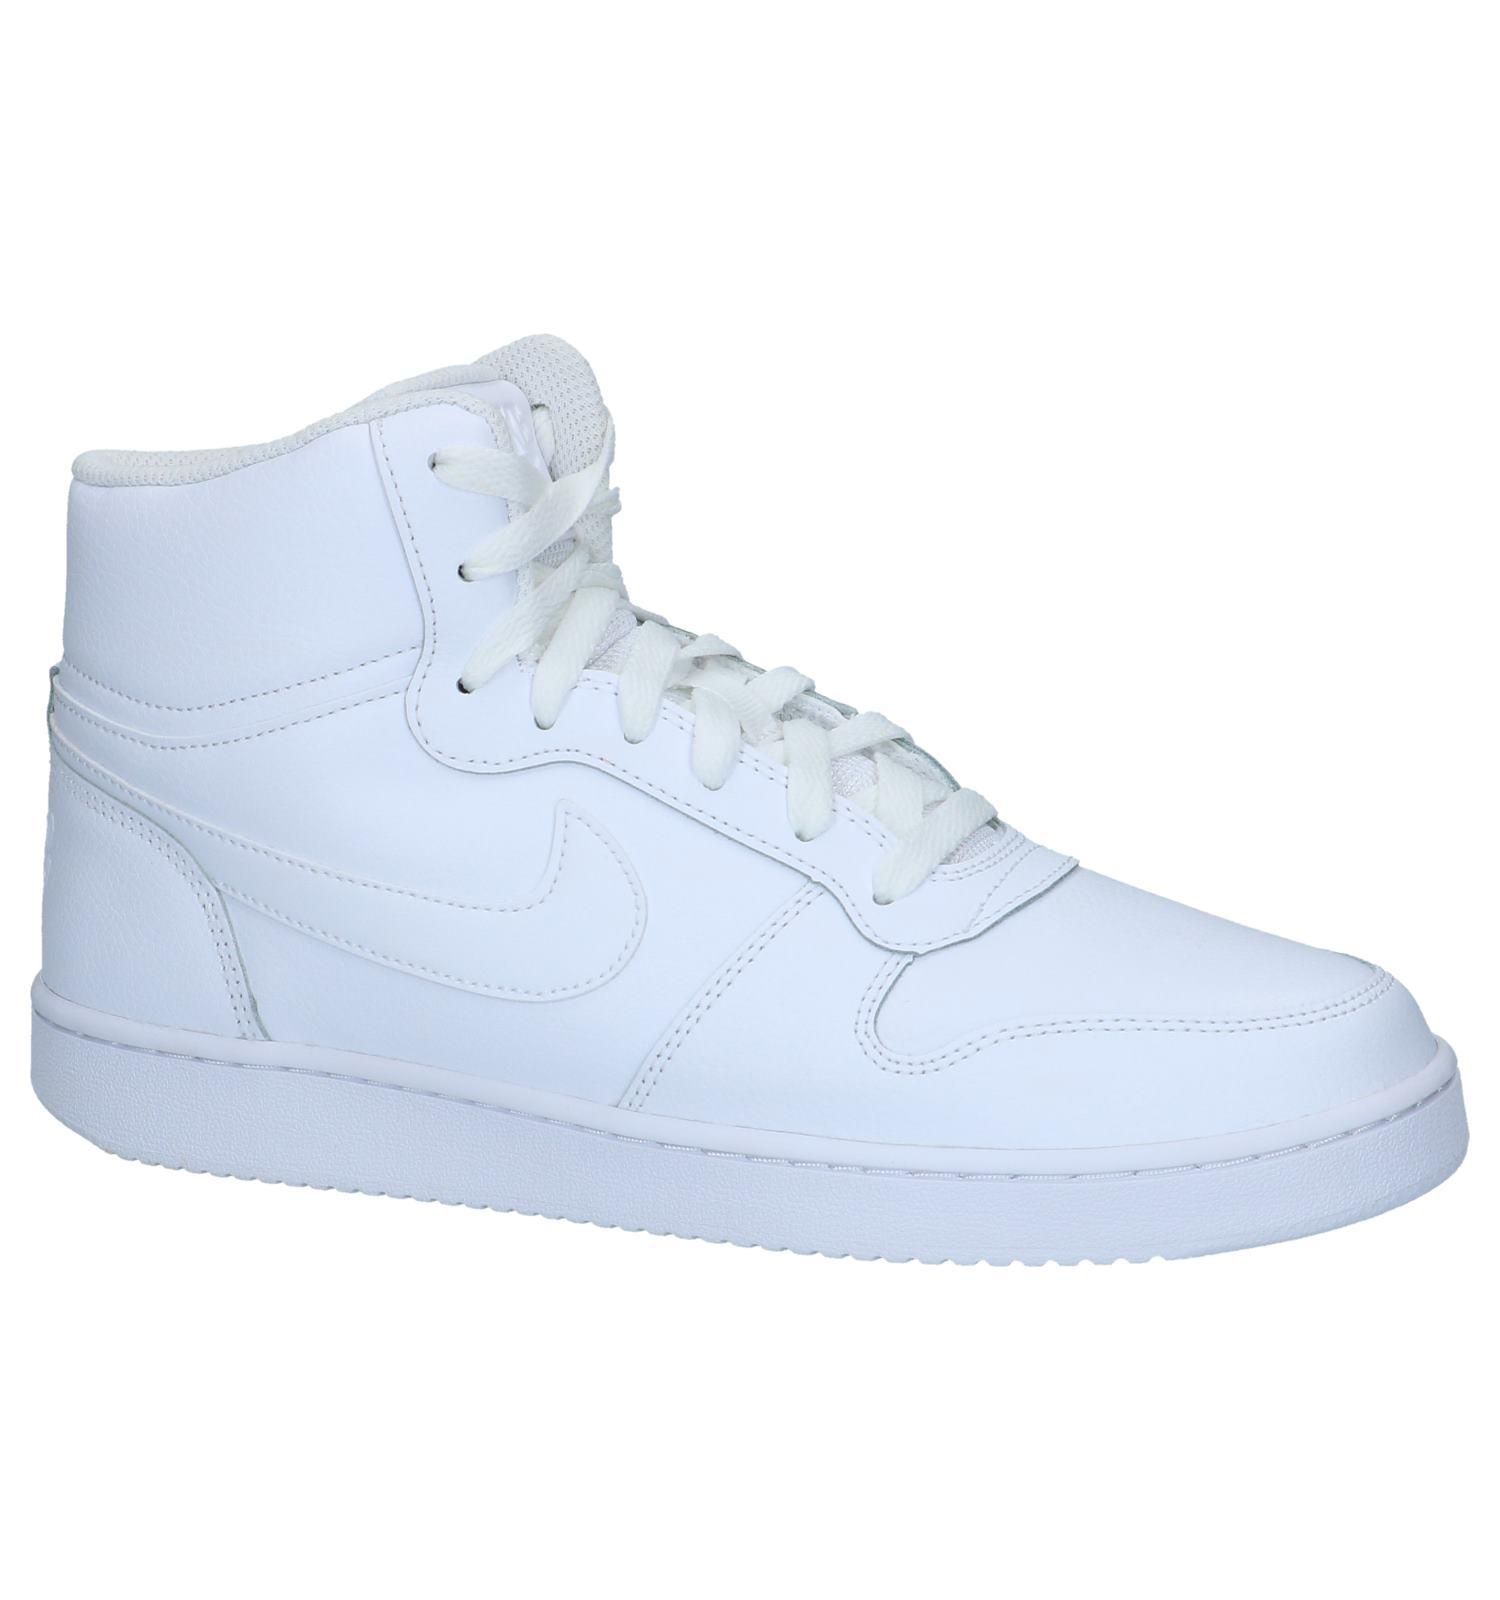 Welp Witte Nike Ebernon Sneakers Hoog | TORFS.BE | Gratis verzend en retour KB-56